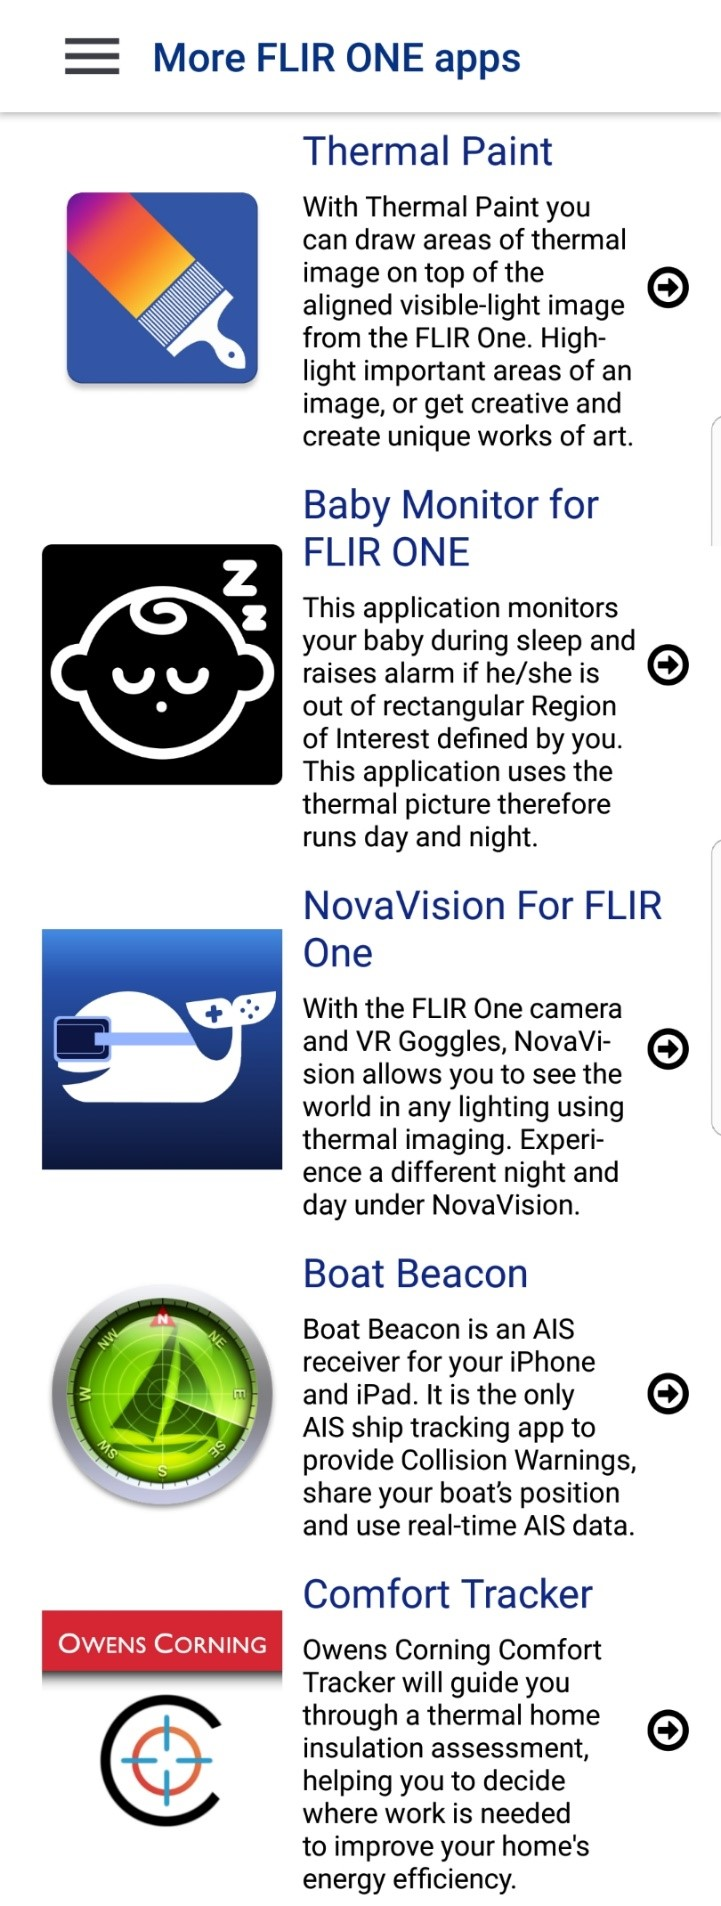 FLIR ONE Apps